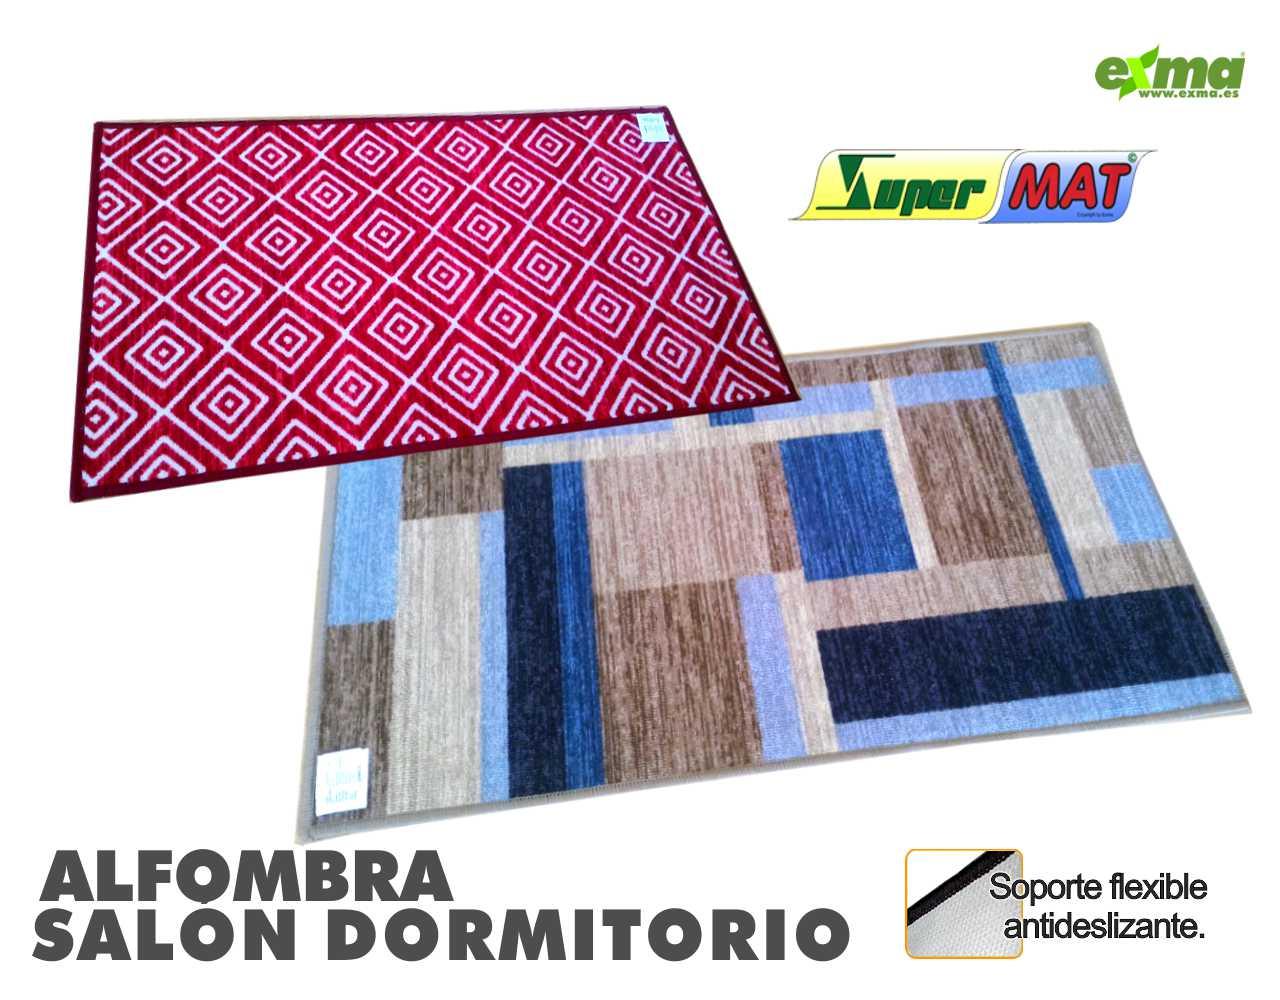 alfombra salon dormitorio cocina